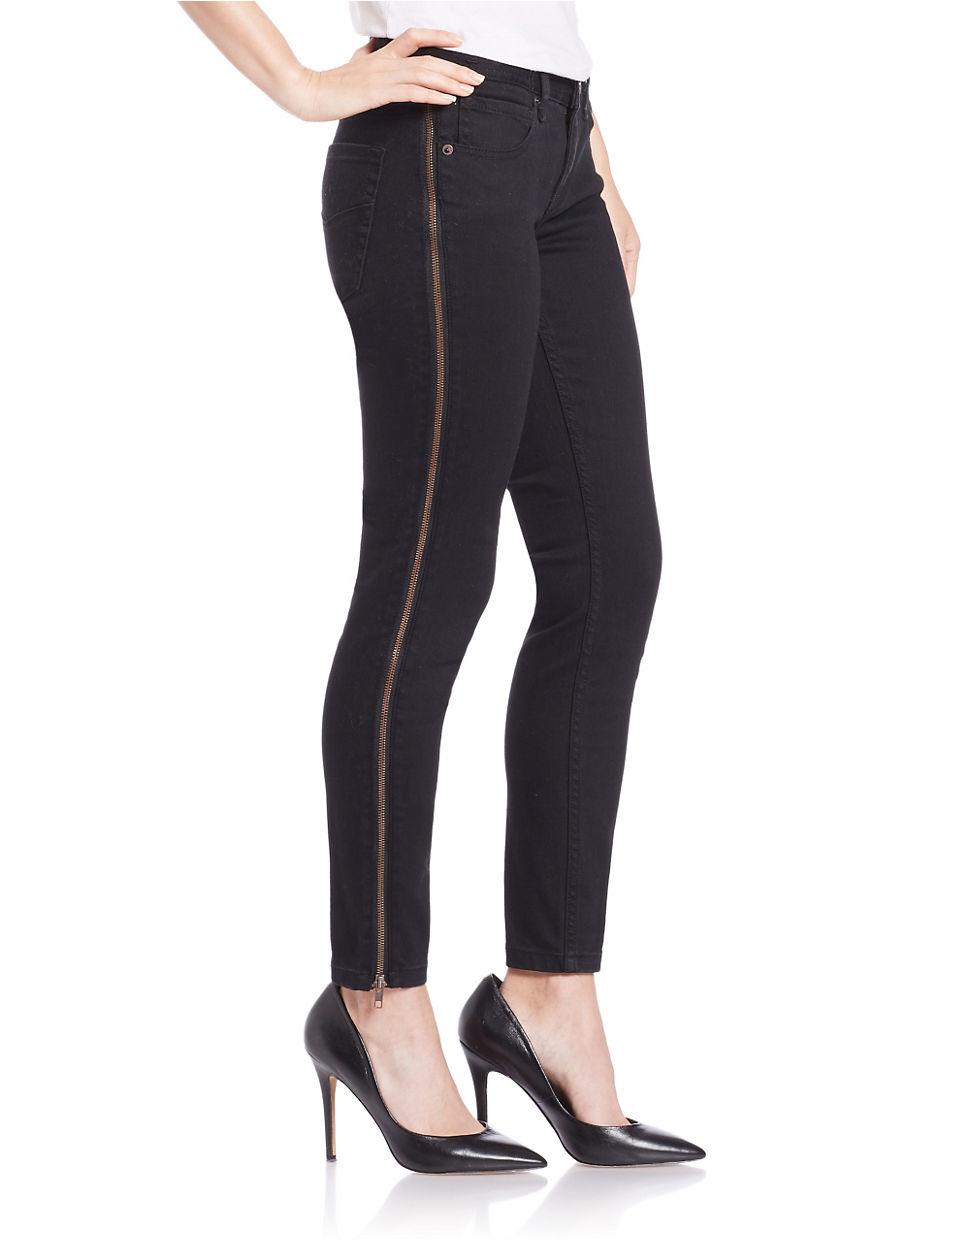 Free people Zip-cuff Skinny Jeans- Black in Black   Lyst